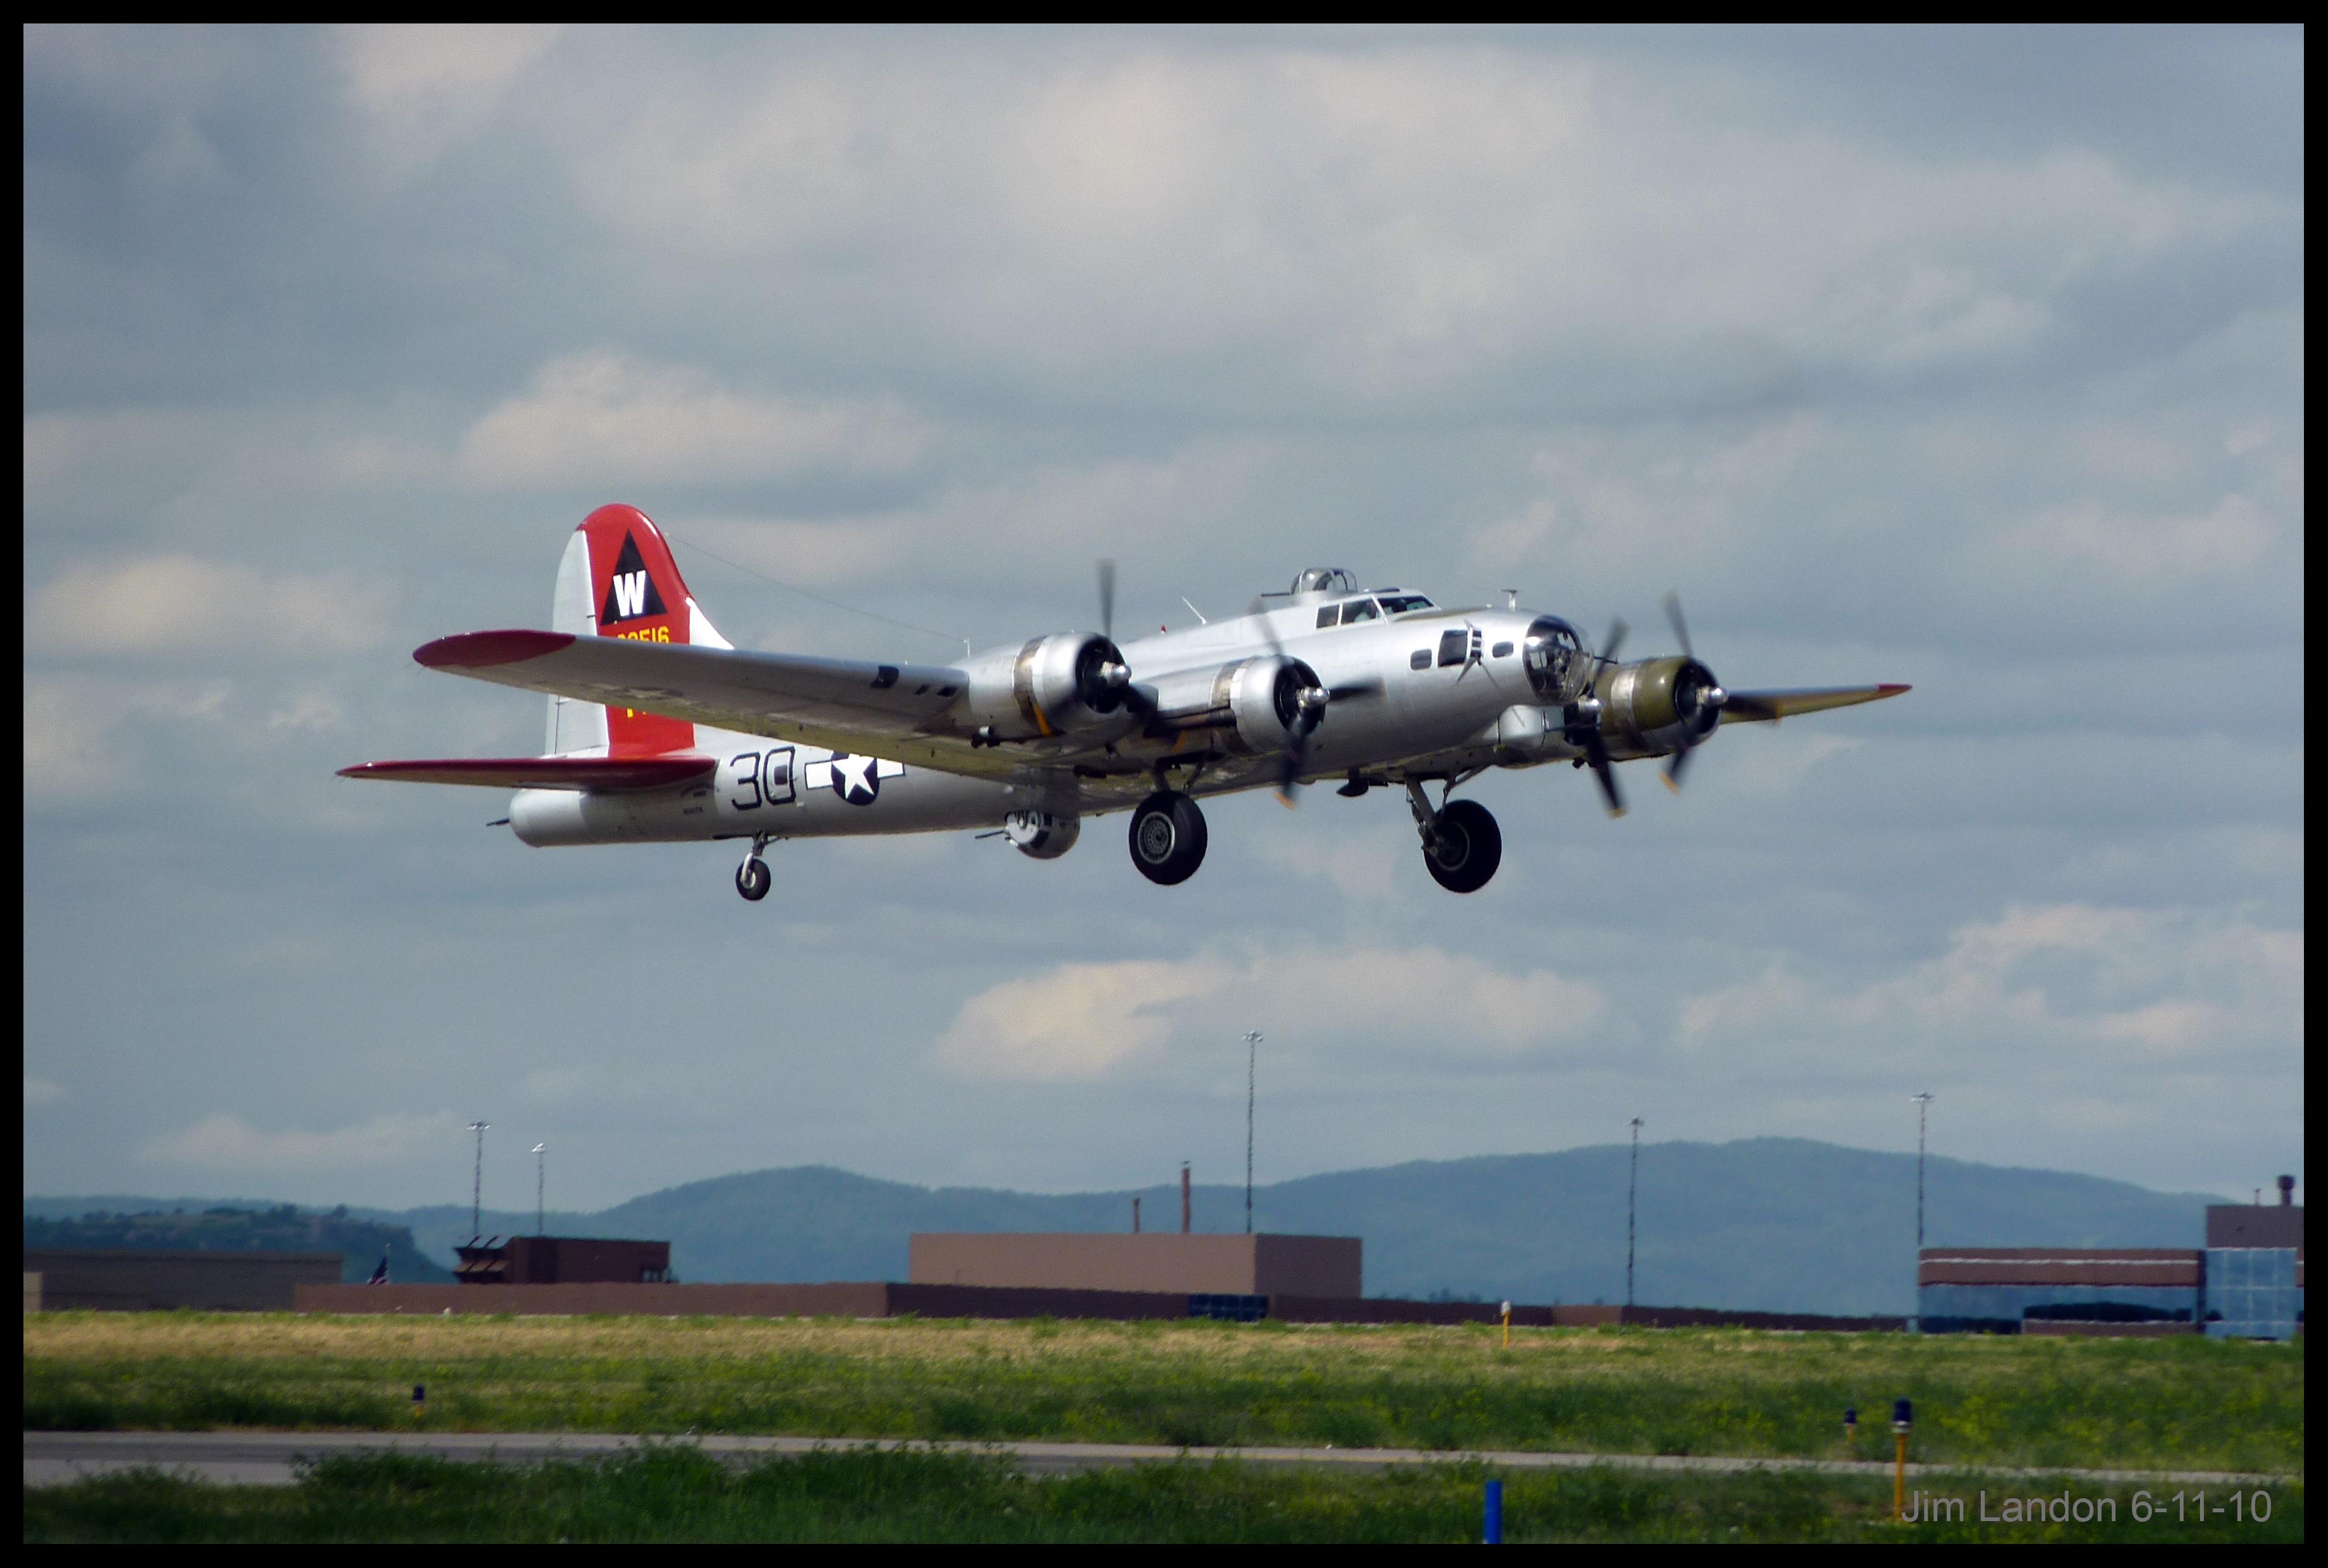 Wallpaper Friends USA America Photoshop Plane Airplane Lumix Airport War Colorado Unitedstates Aviation Military Wwii Memories Denver